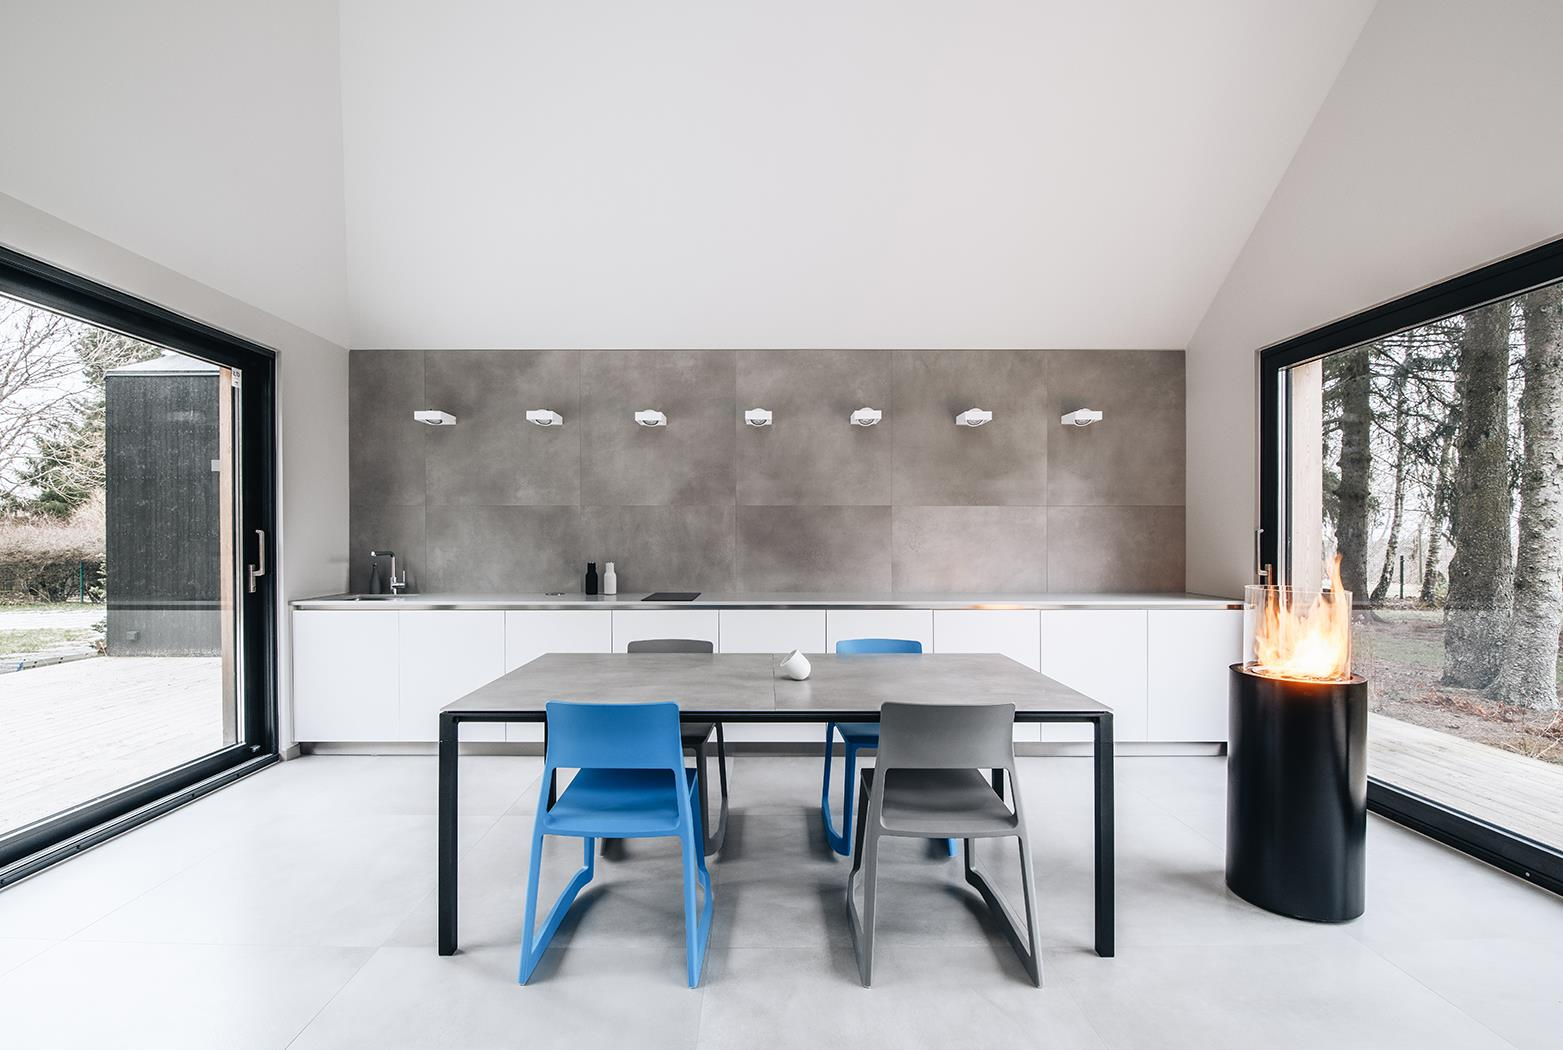 AET PIEL DISAIN OÜ interior architects